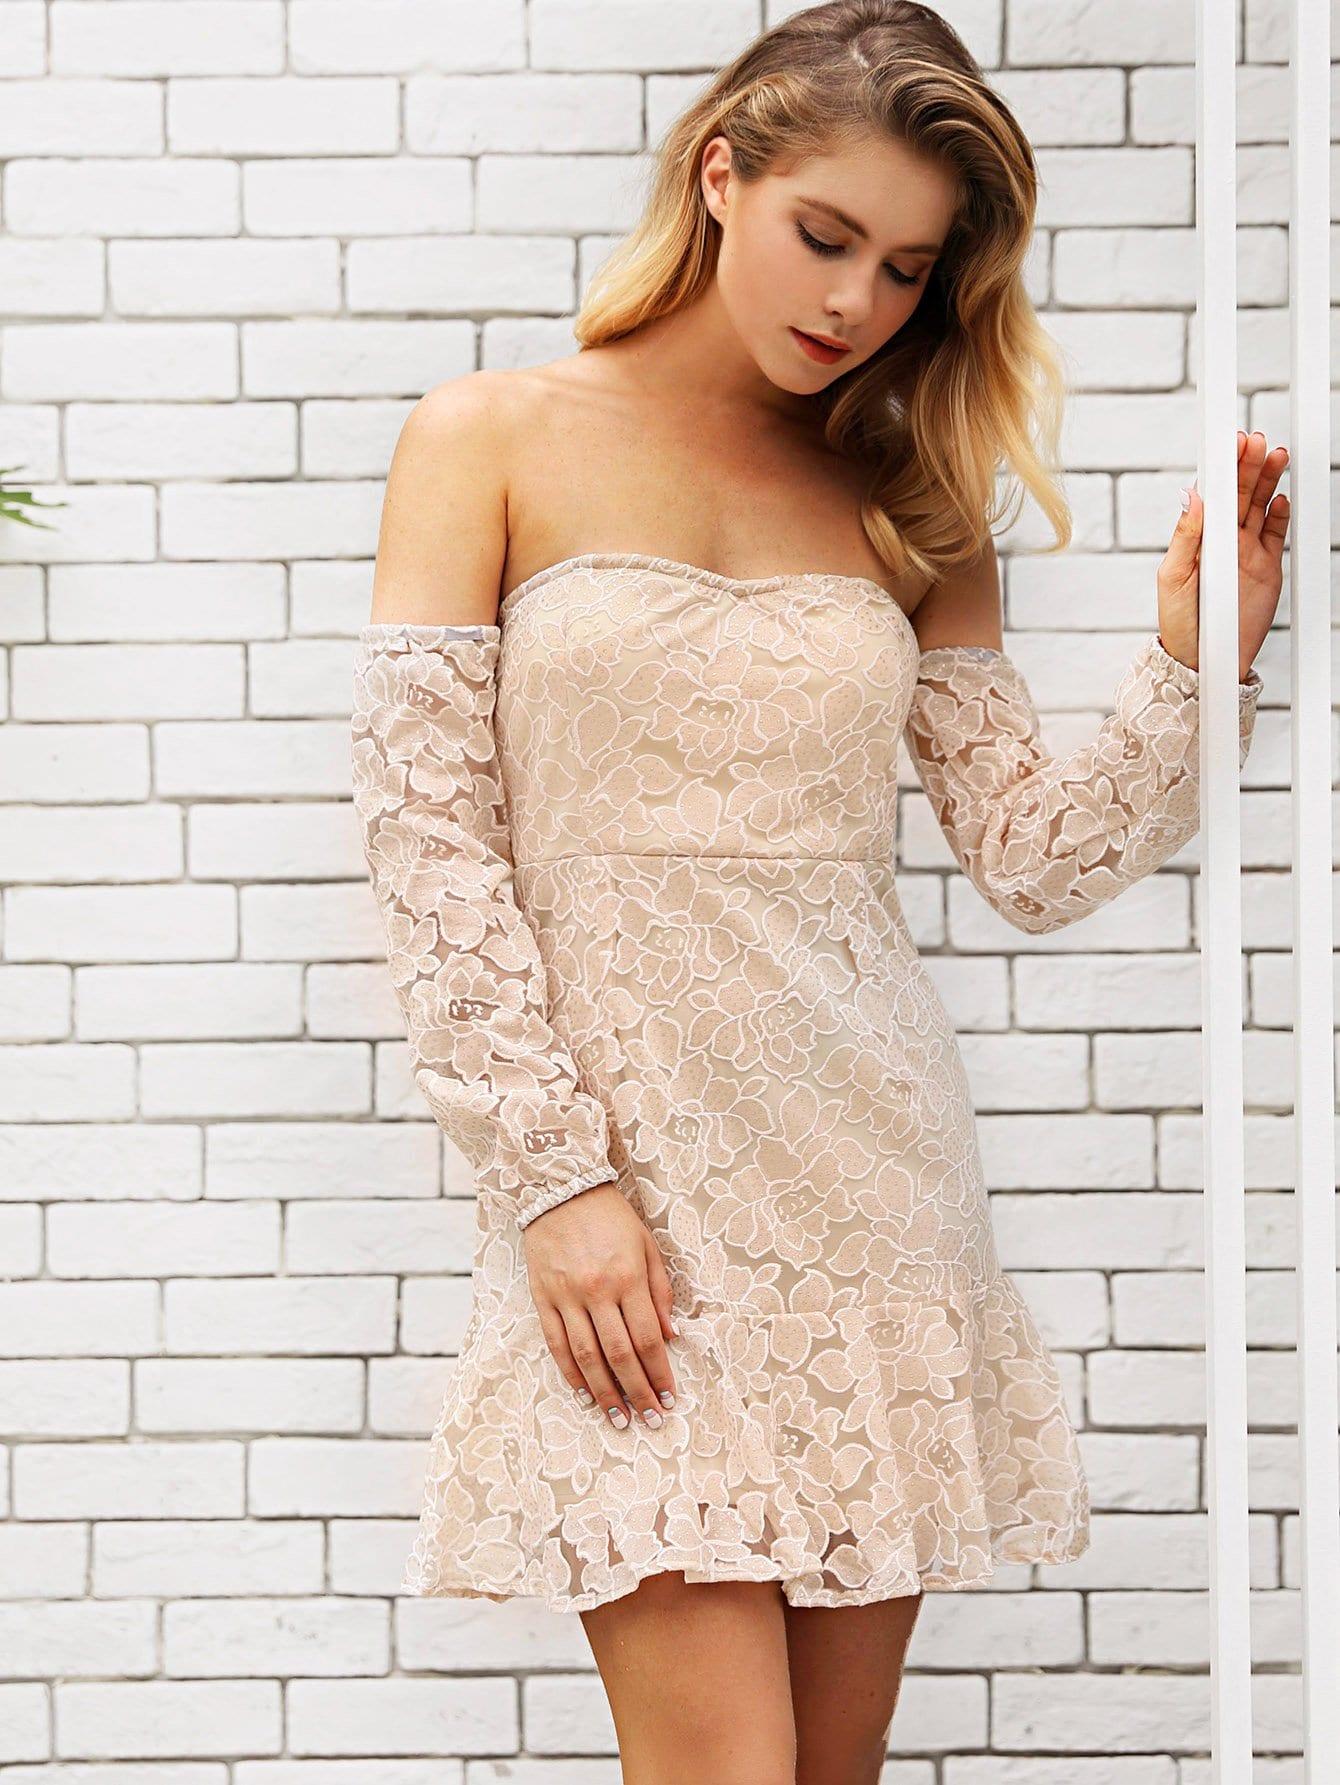 Lace Off Shoulder Dress lace off shoulder dress